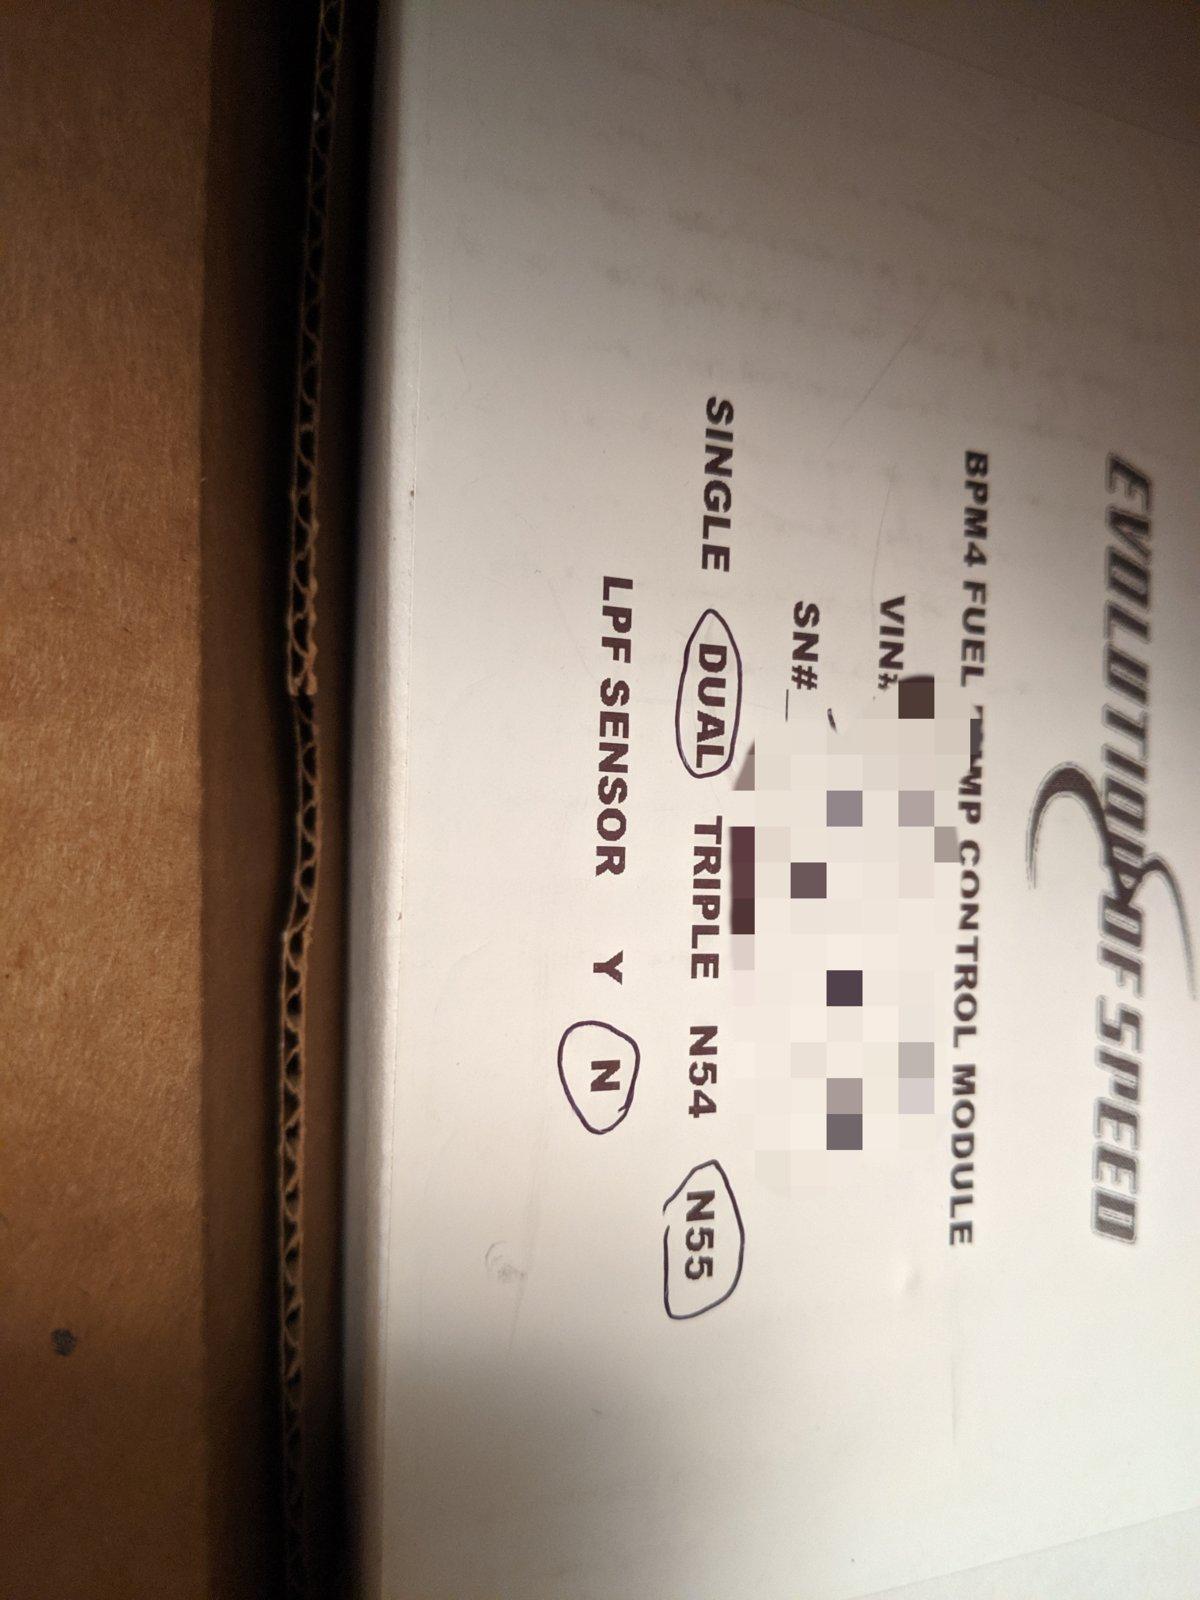 Walbro 525 wiring | BMW - SpoolStreet